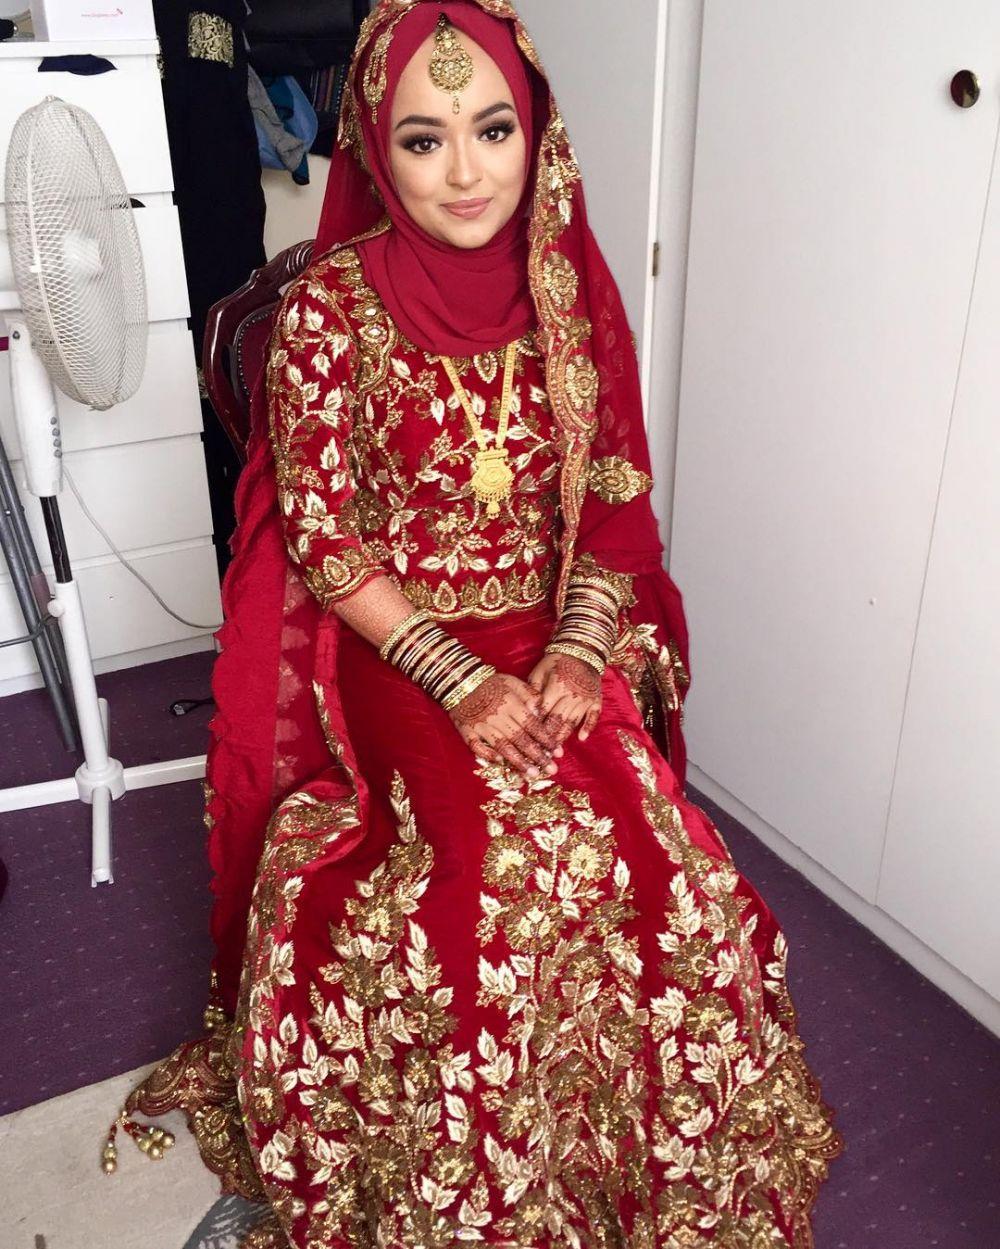 957323-1000xauto-baju-pengantin-india-berhijab.jpg